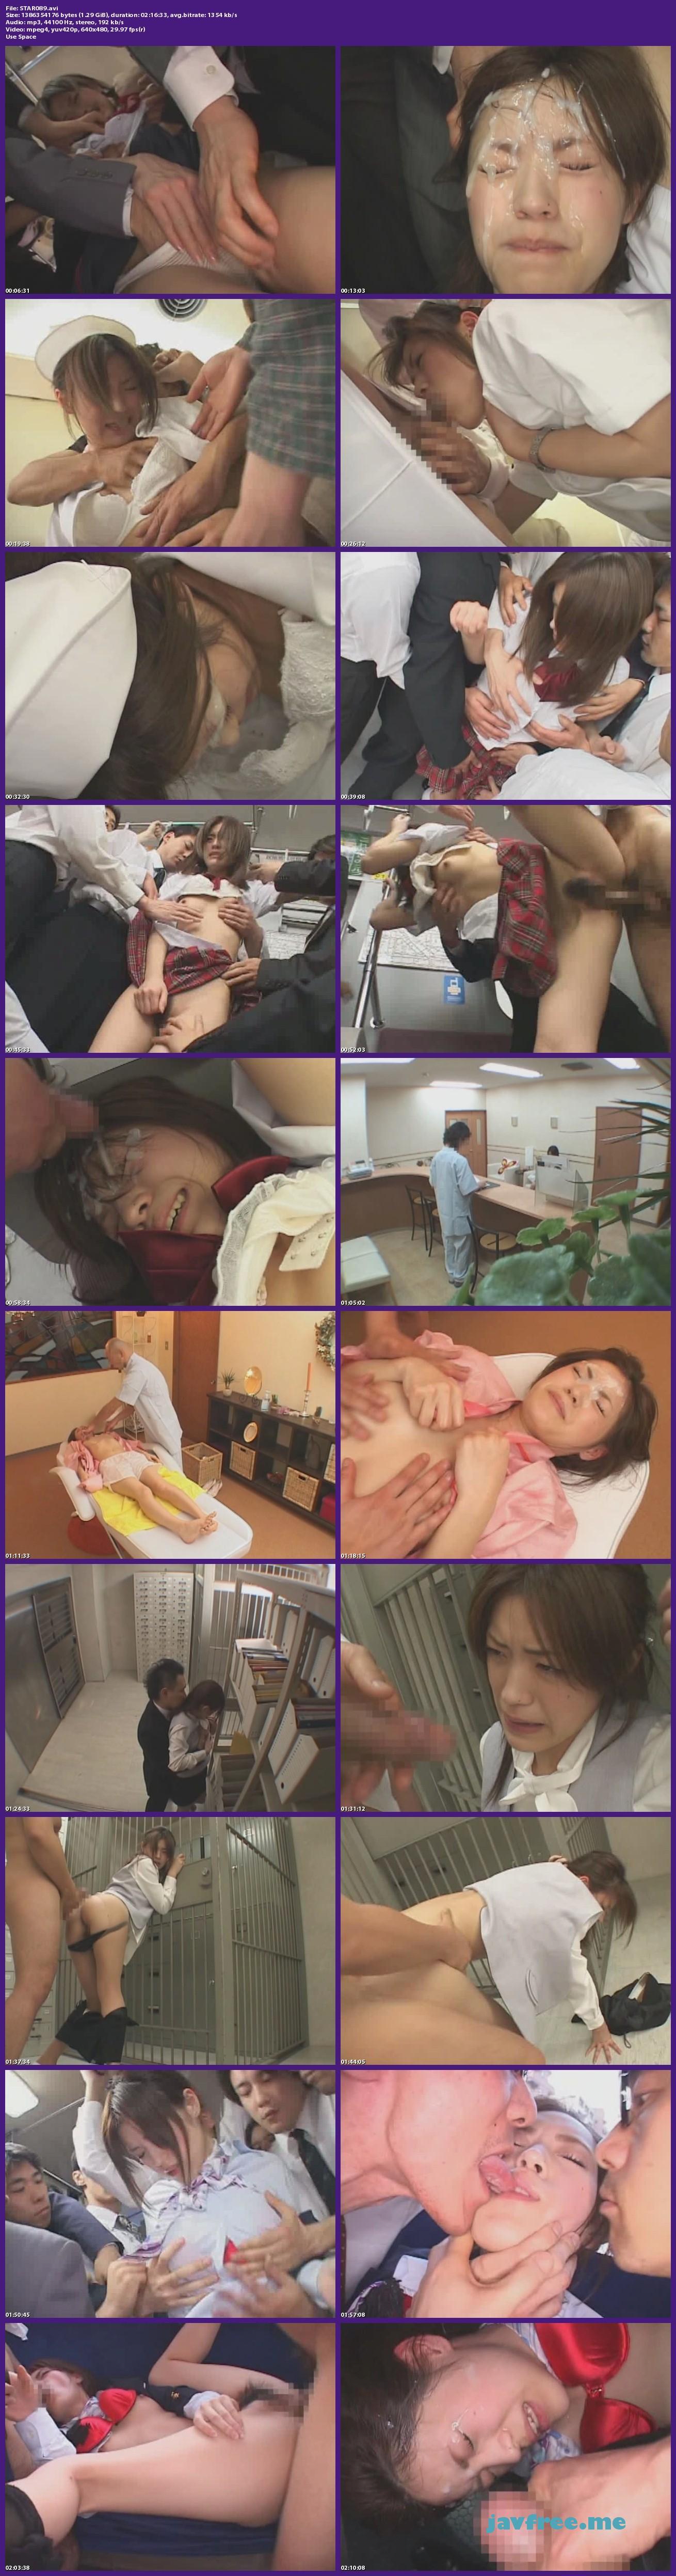 [STAR 089] 芸能人 板垣あずさ 元制○コレクション 激痴漢地獄 板垣あずさ STAR